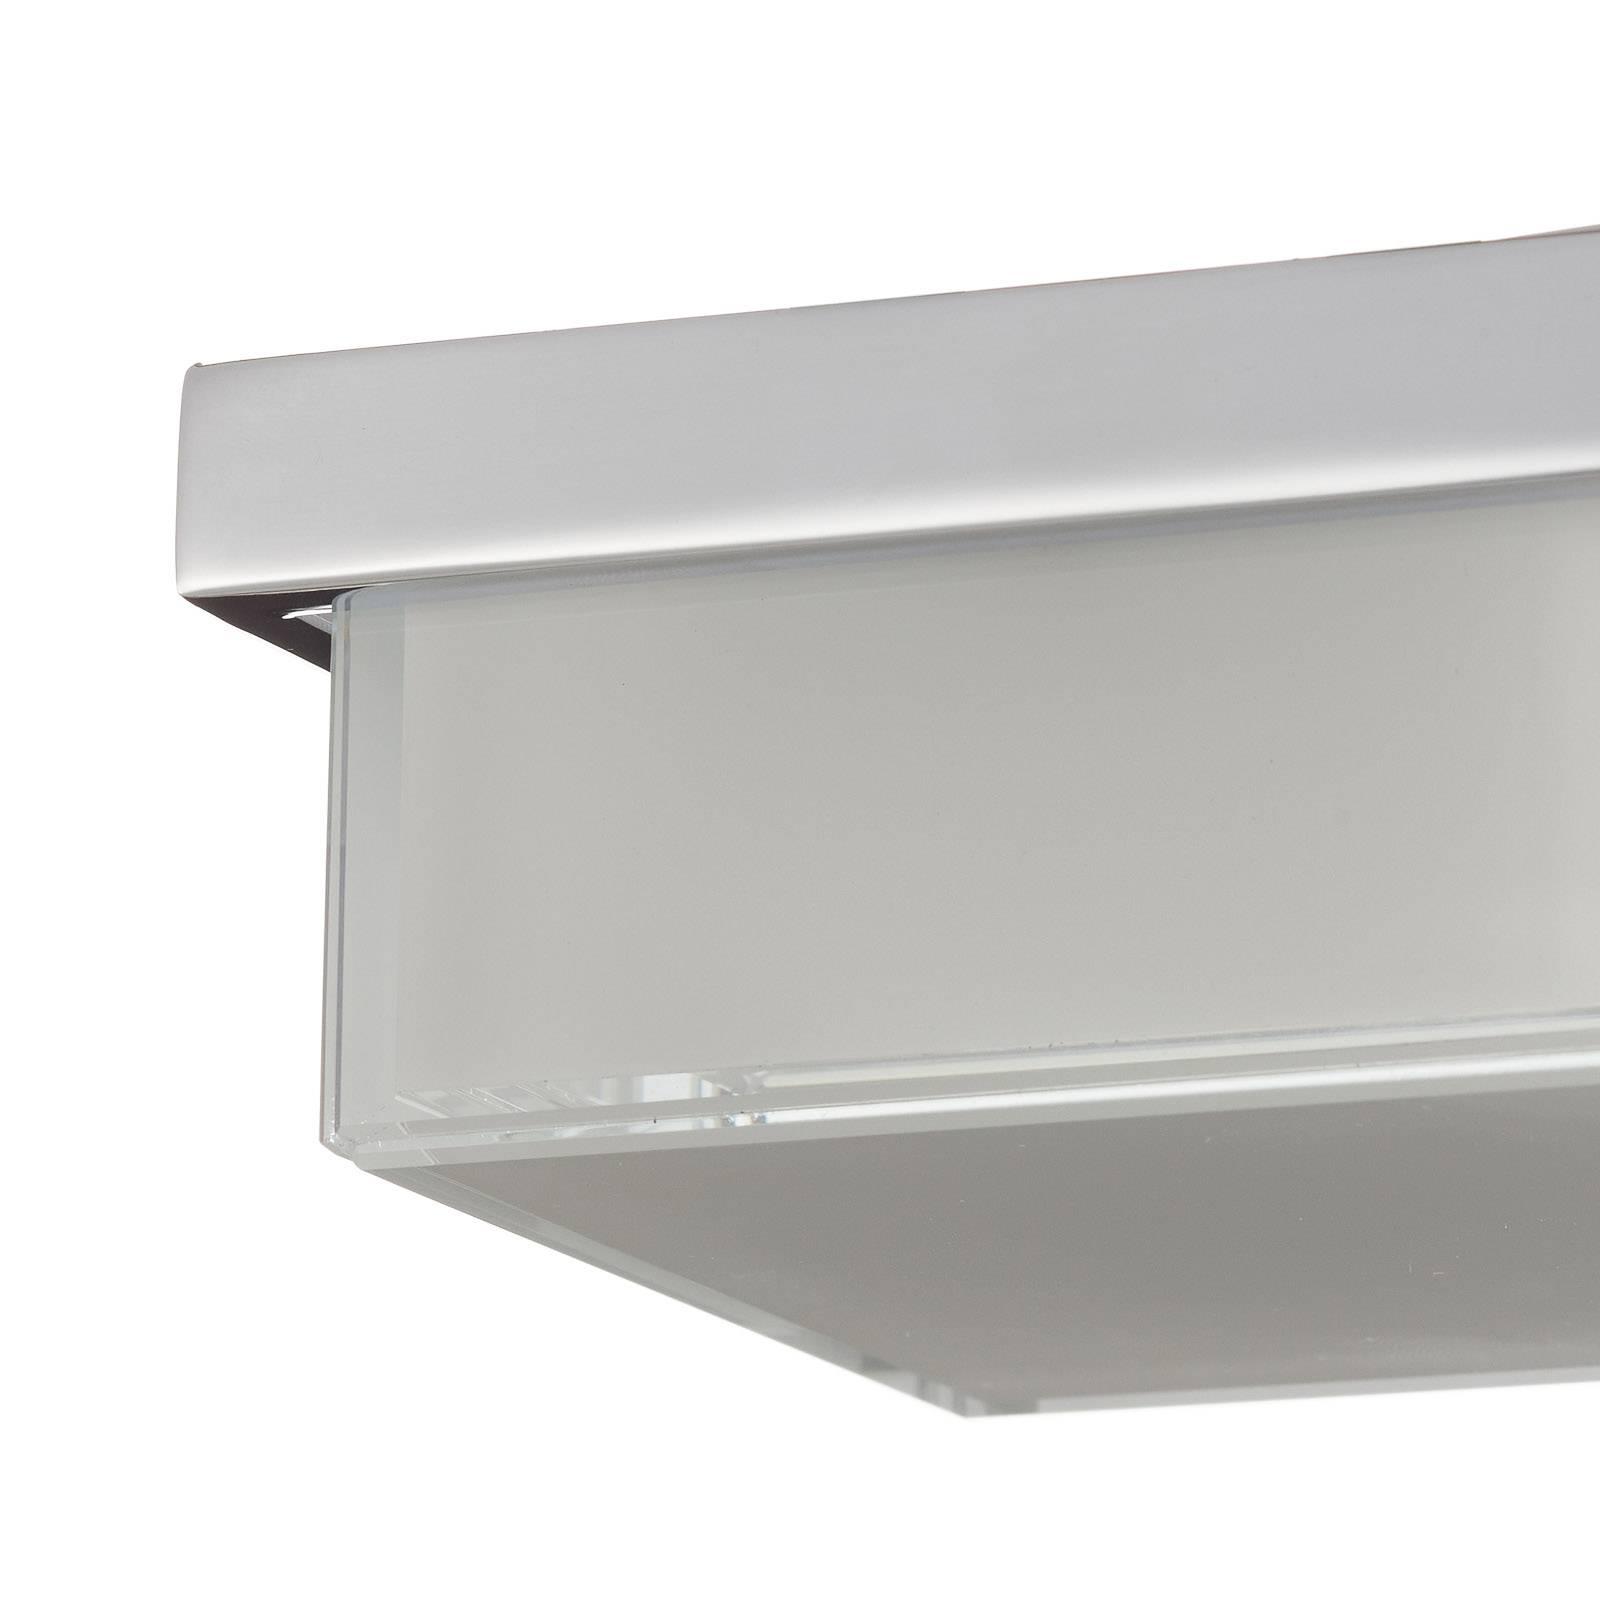 Helestra Cosi -LED-kattovalaisin, kromi 11x11 cm